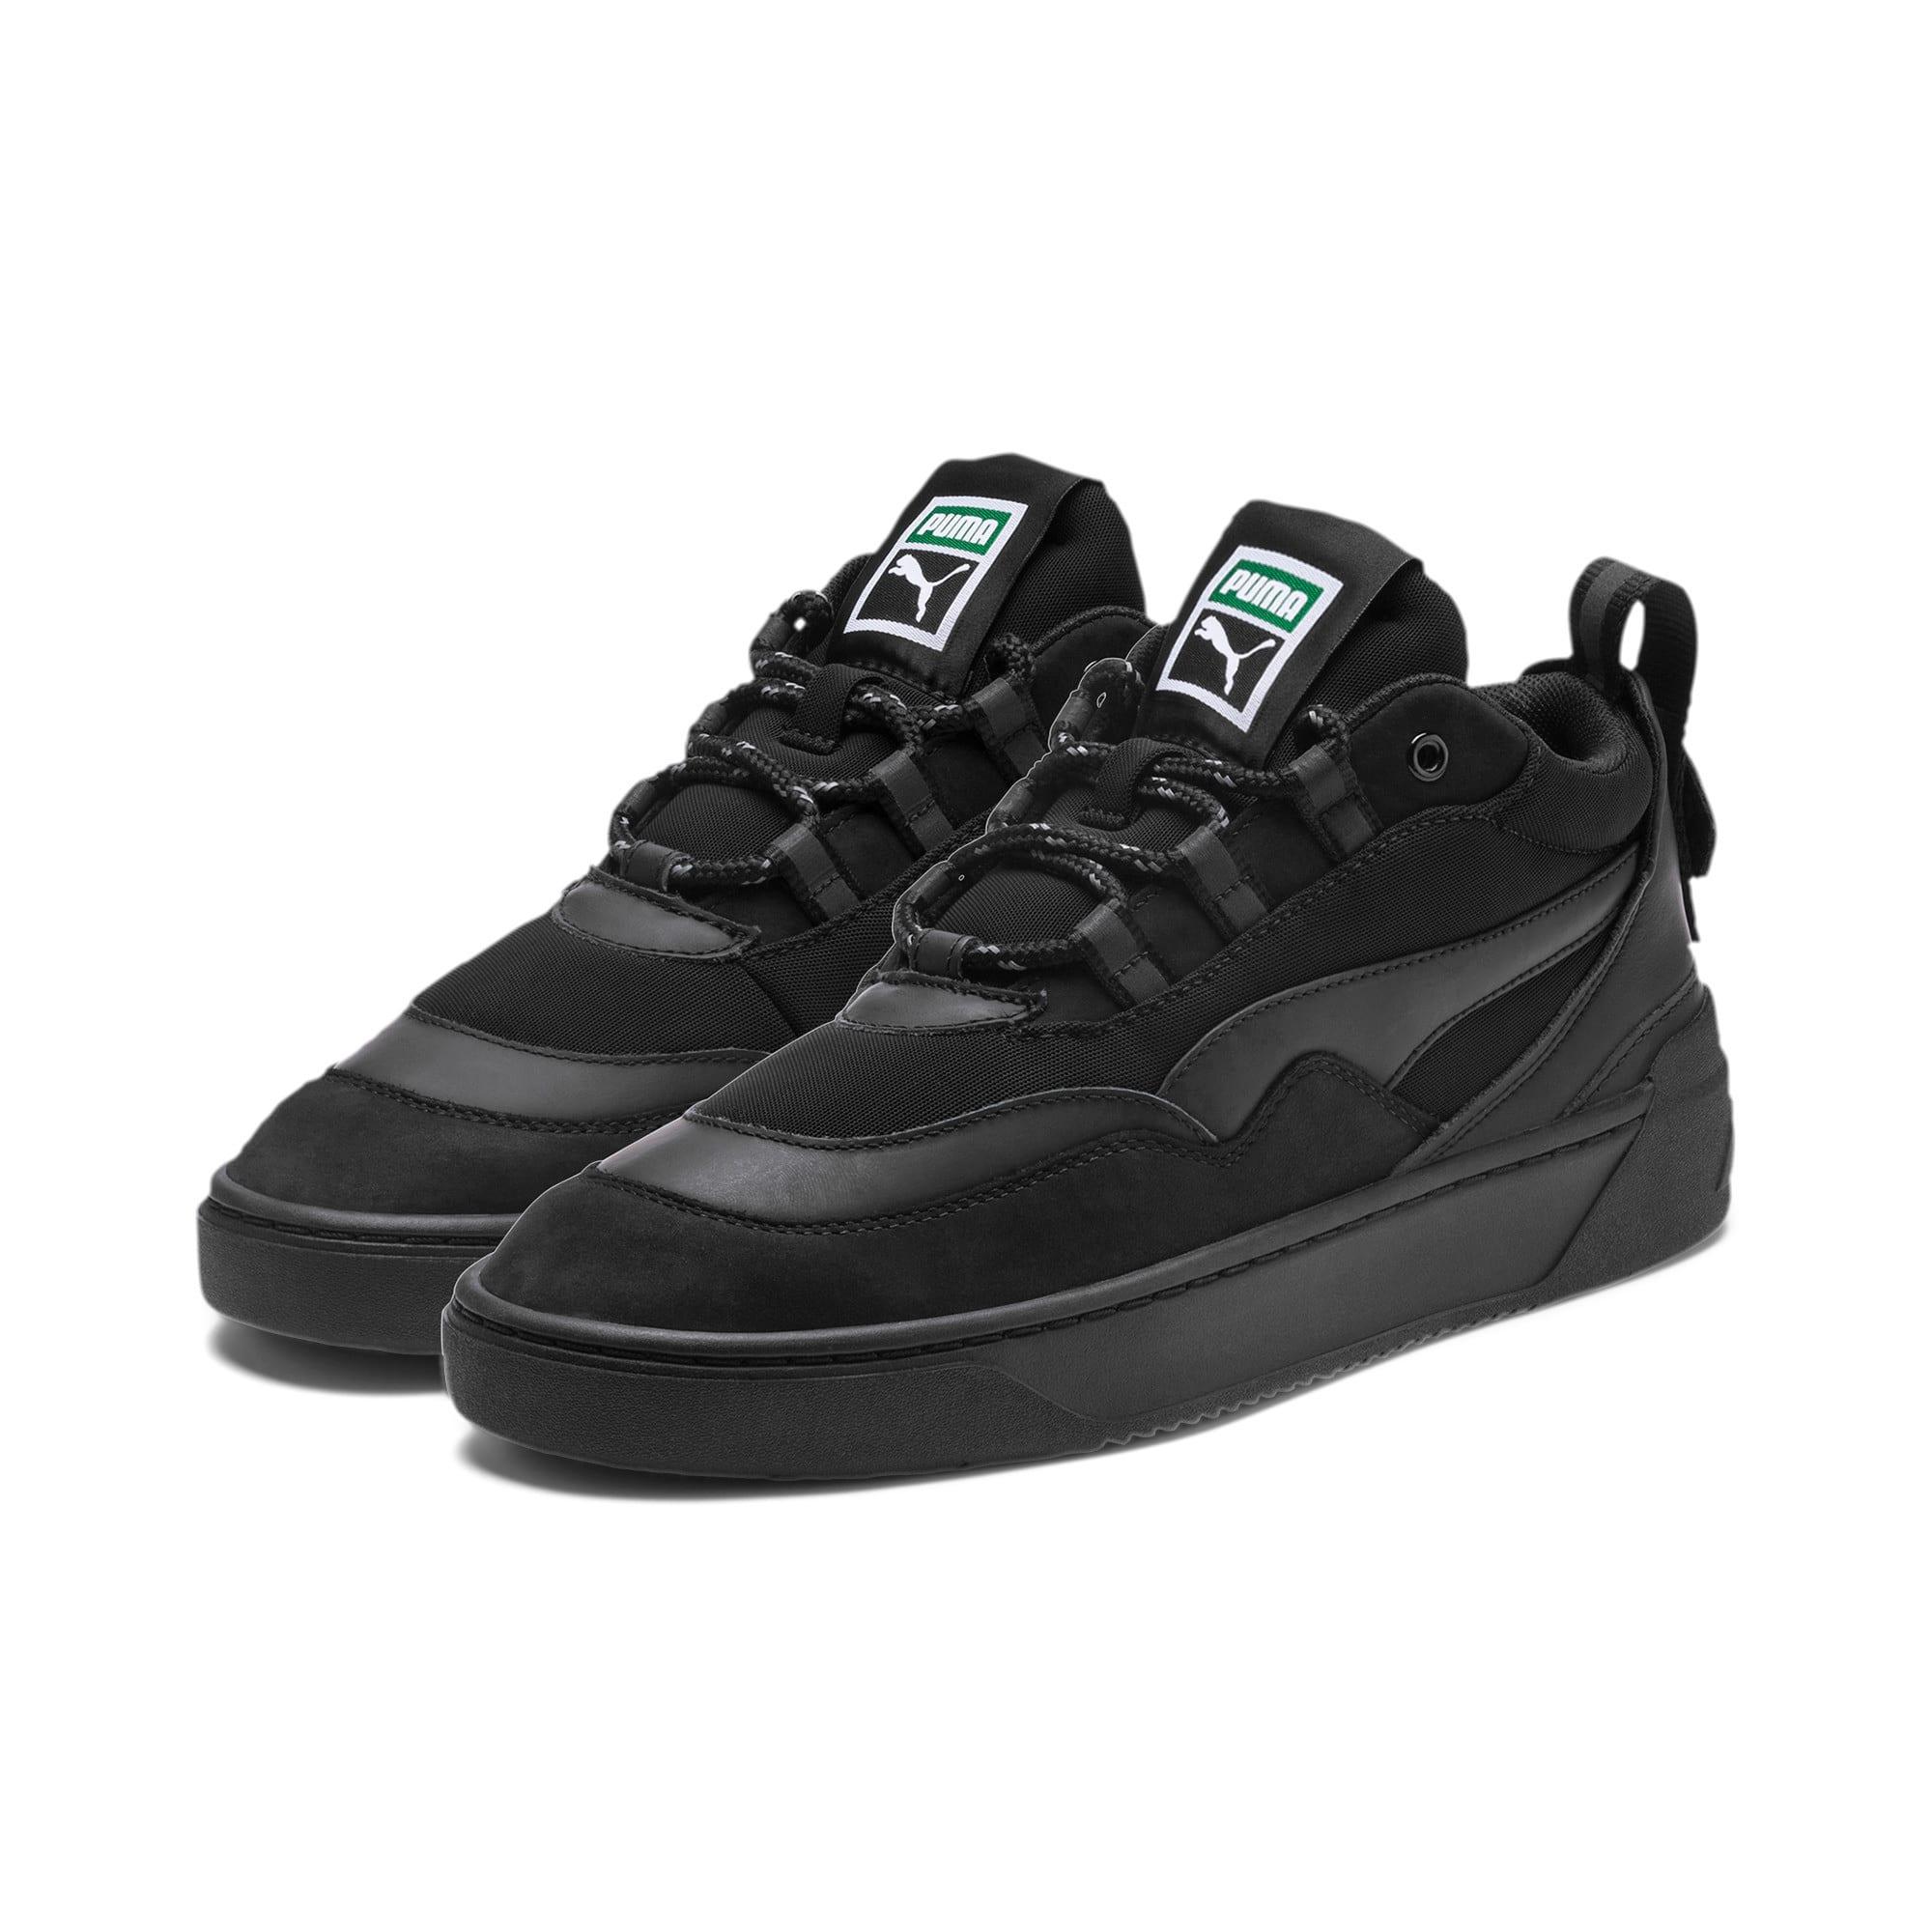 Thumbnail 2 of Cali Zero Demi Triple Black Sneakers, Puma Black-Puma Black, medium